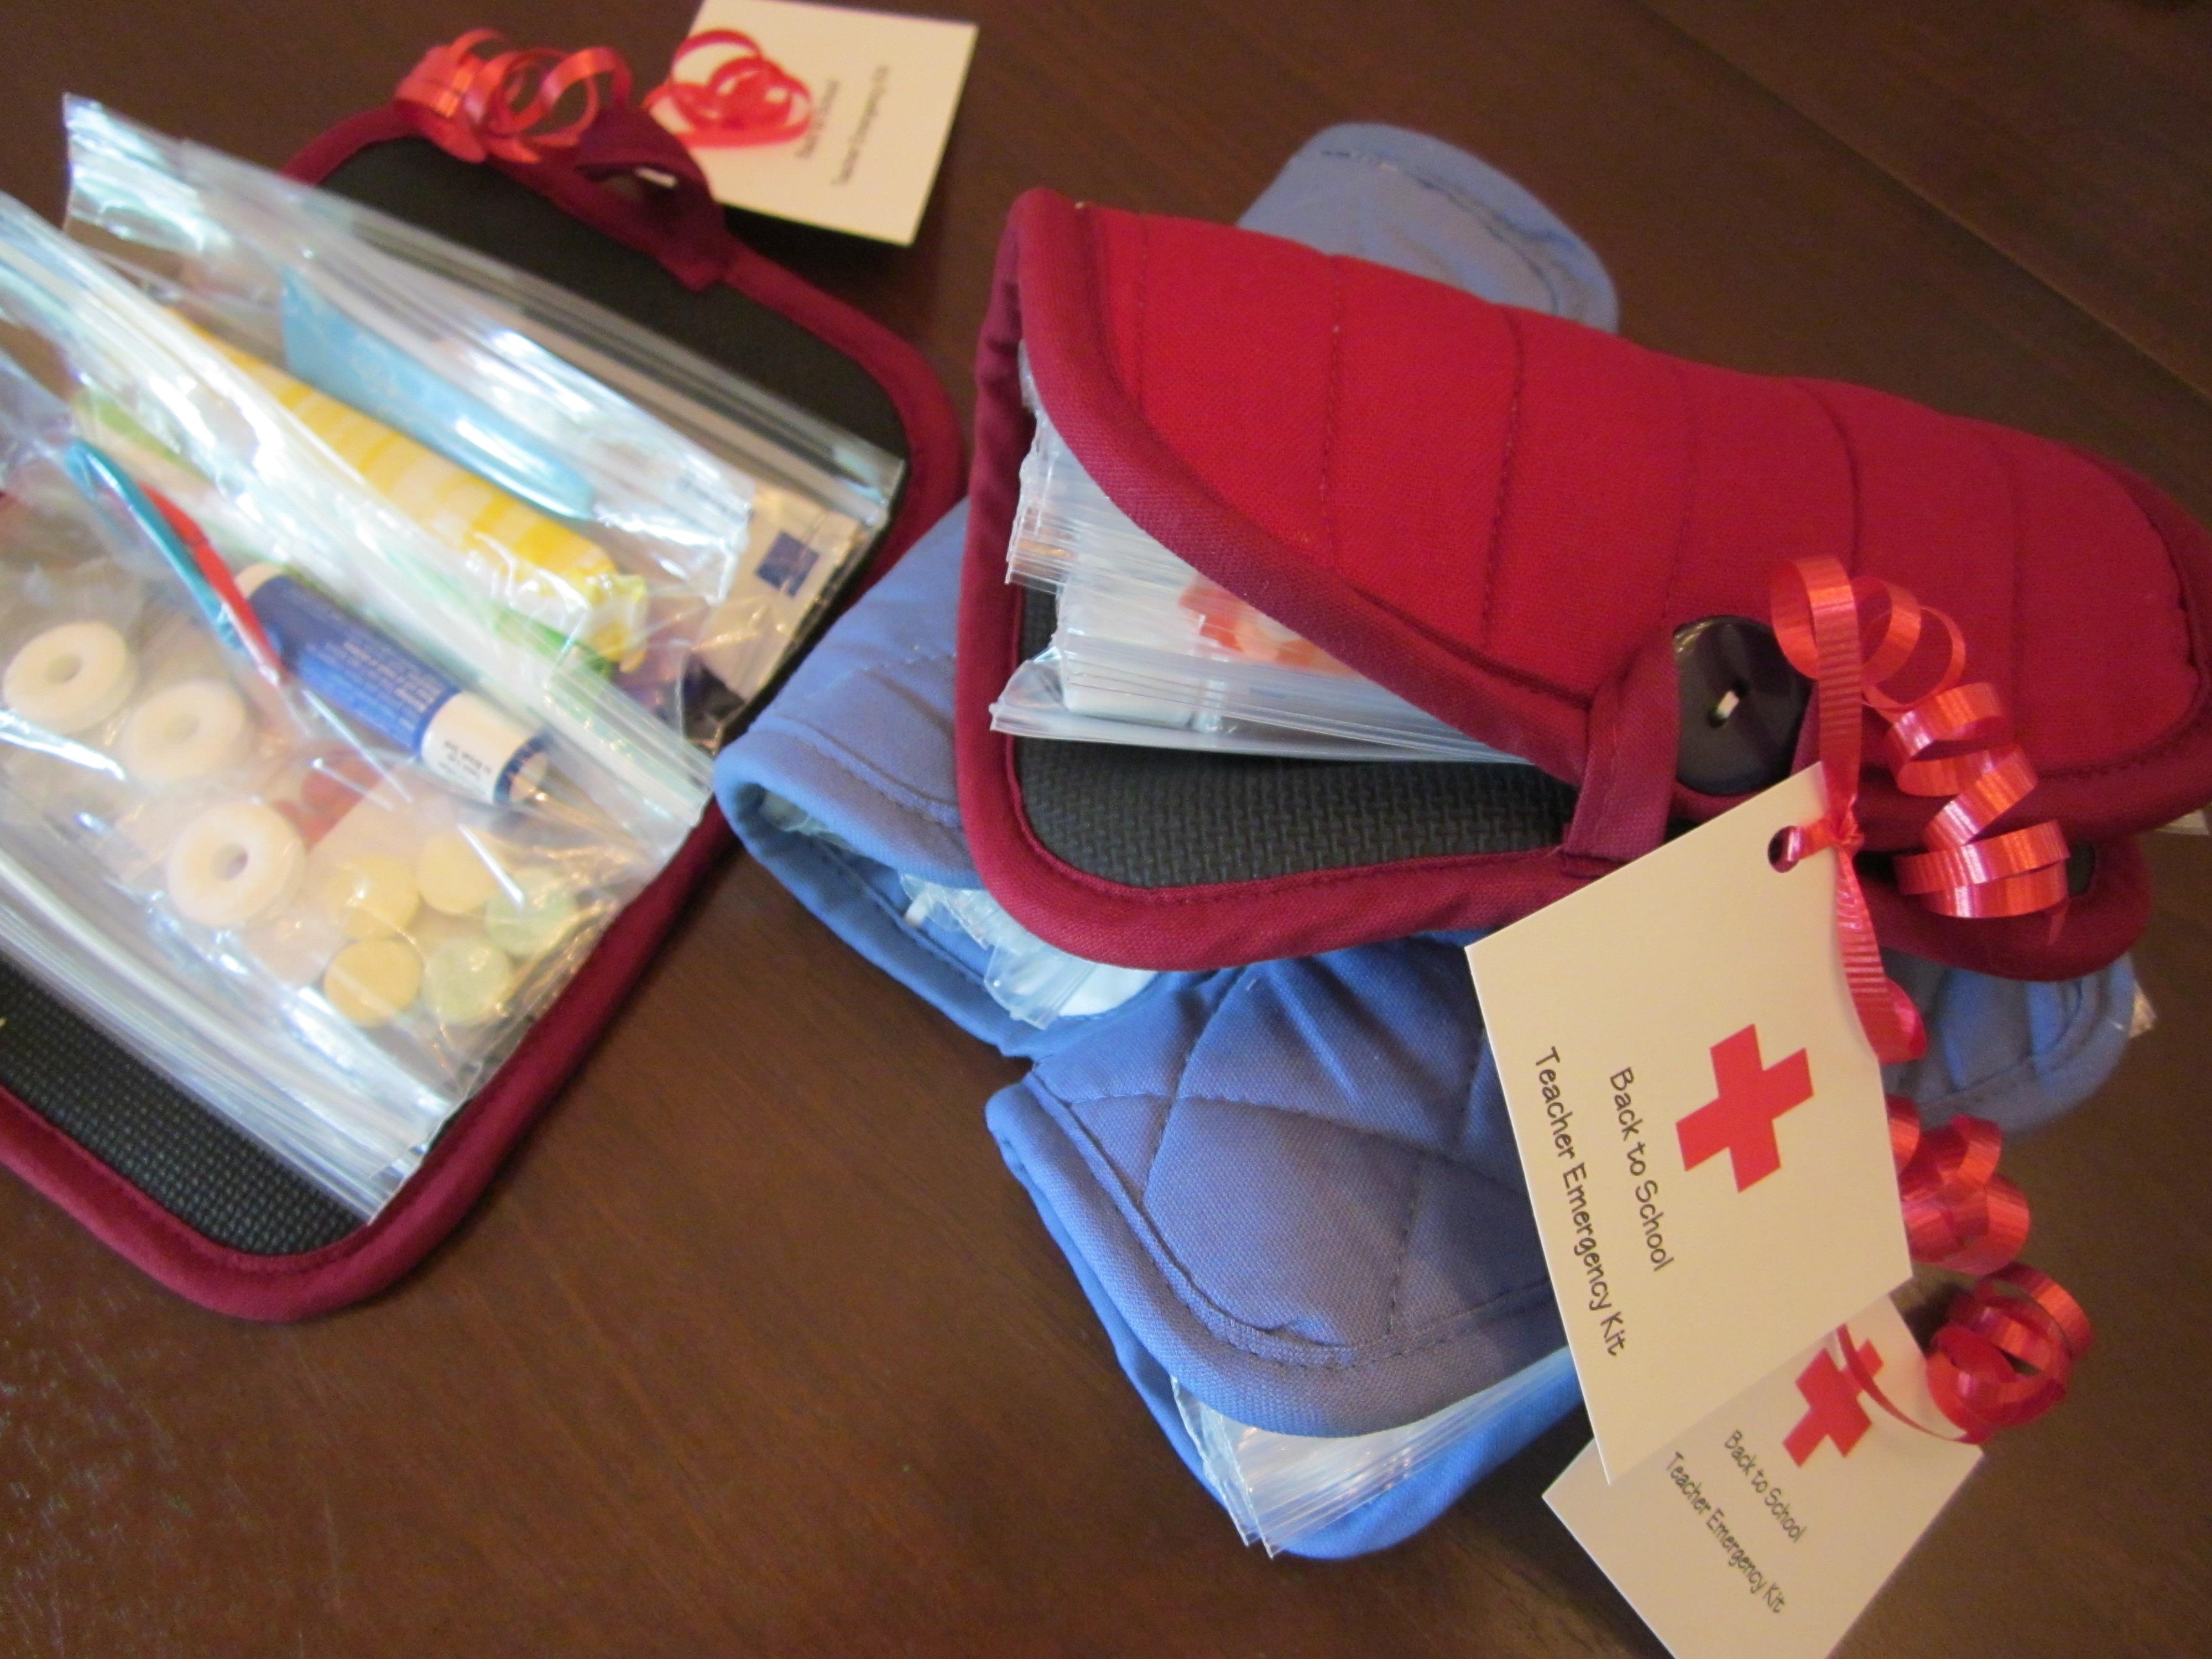 Teacher emergency kit 2013 theroommom teacher emergency kit filled and gift tags solutioingenieria Gallery